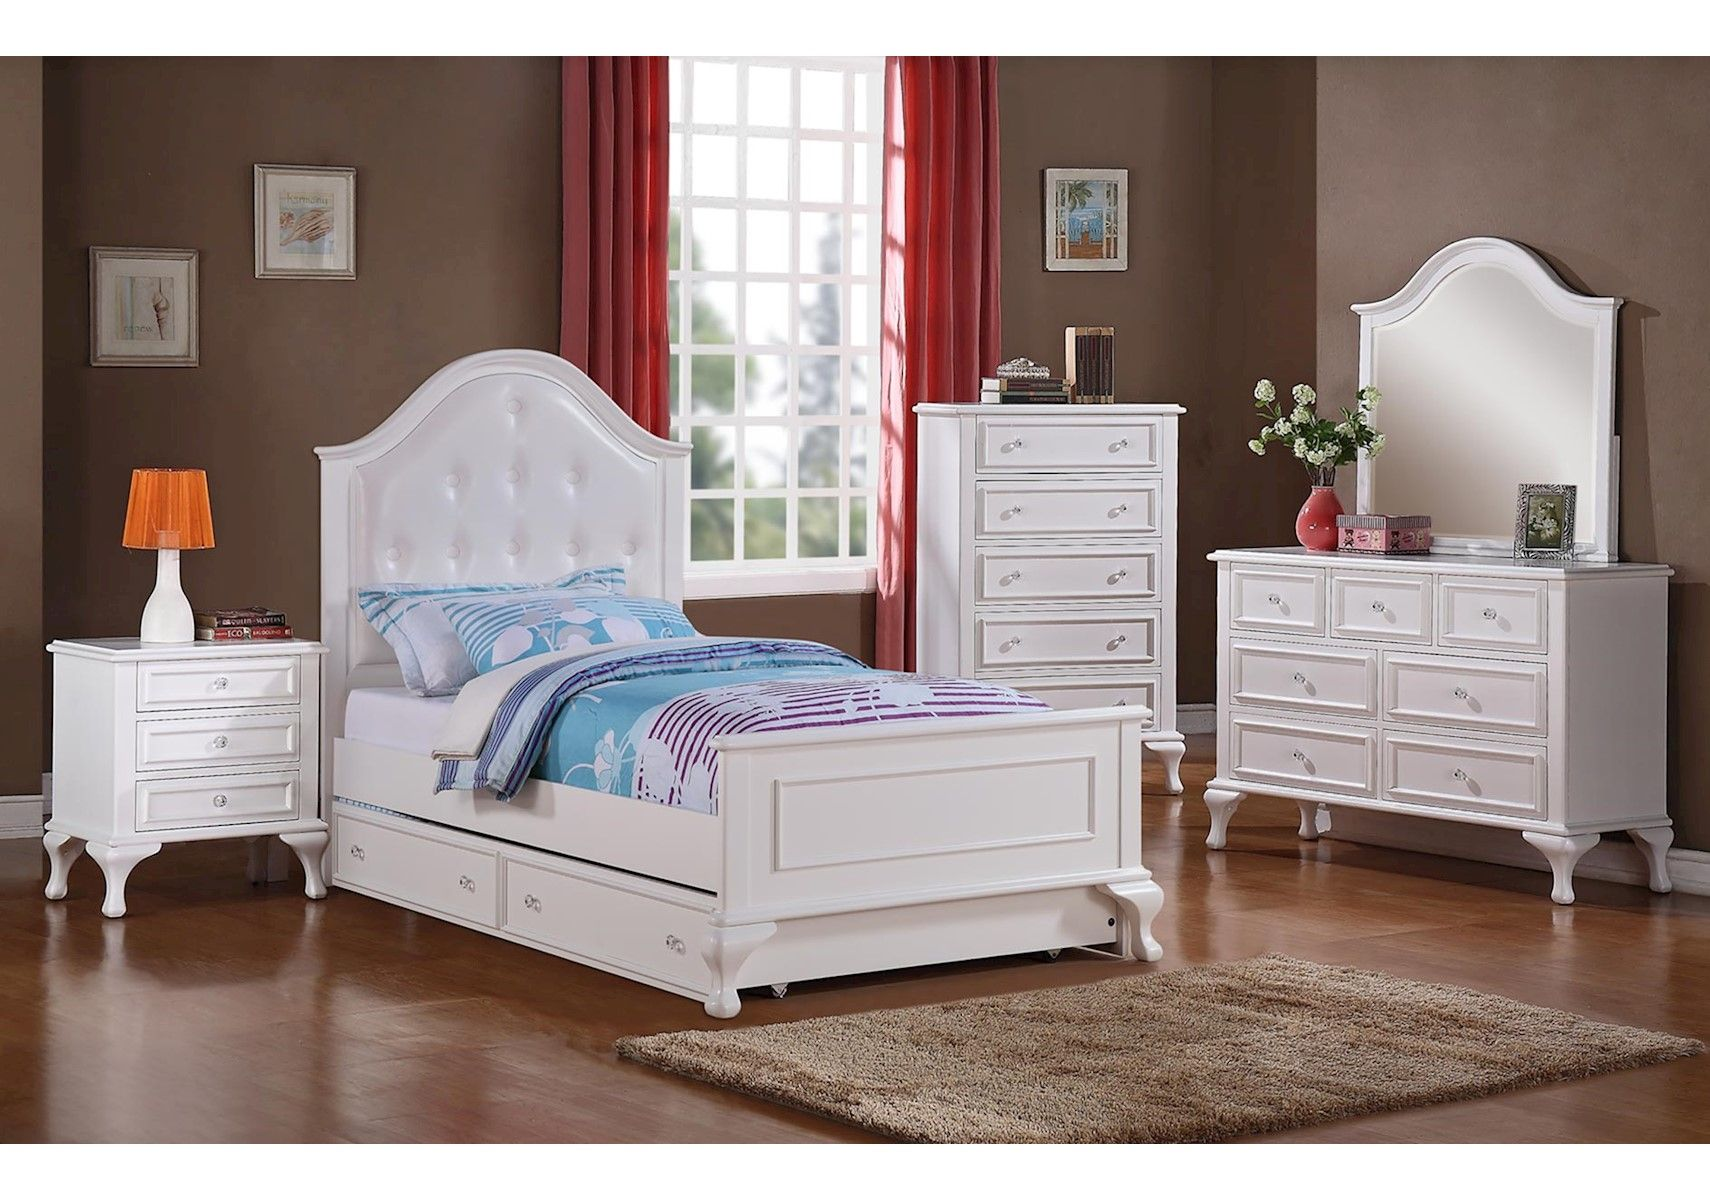 Lacks   Jesse 4 Pc Kids Bedroom Set. Lacks   Jesse 4 Pc Kids Bedroom Set   Black   White Inspiration